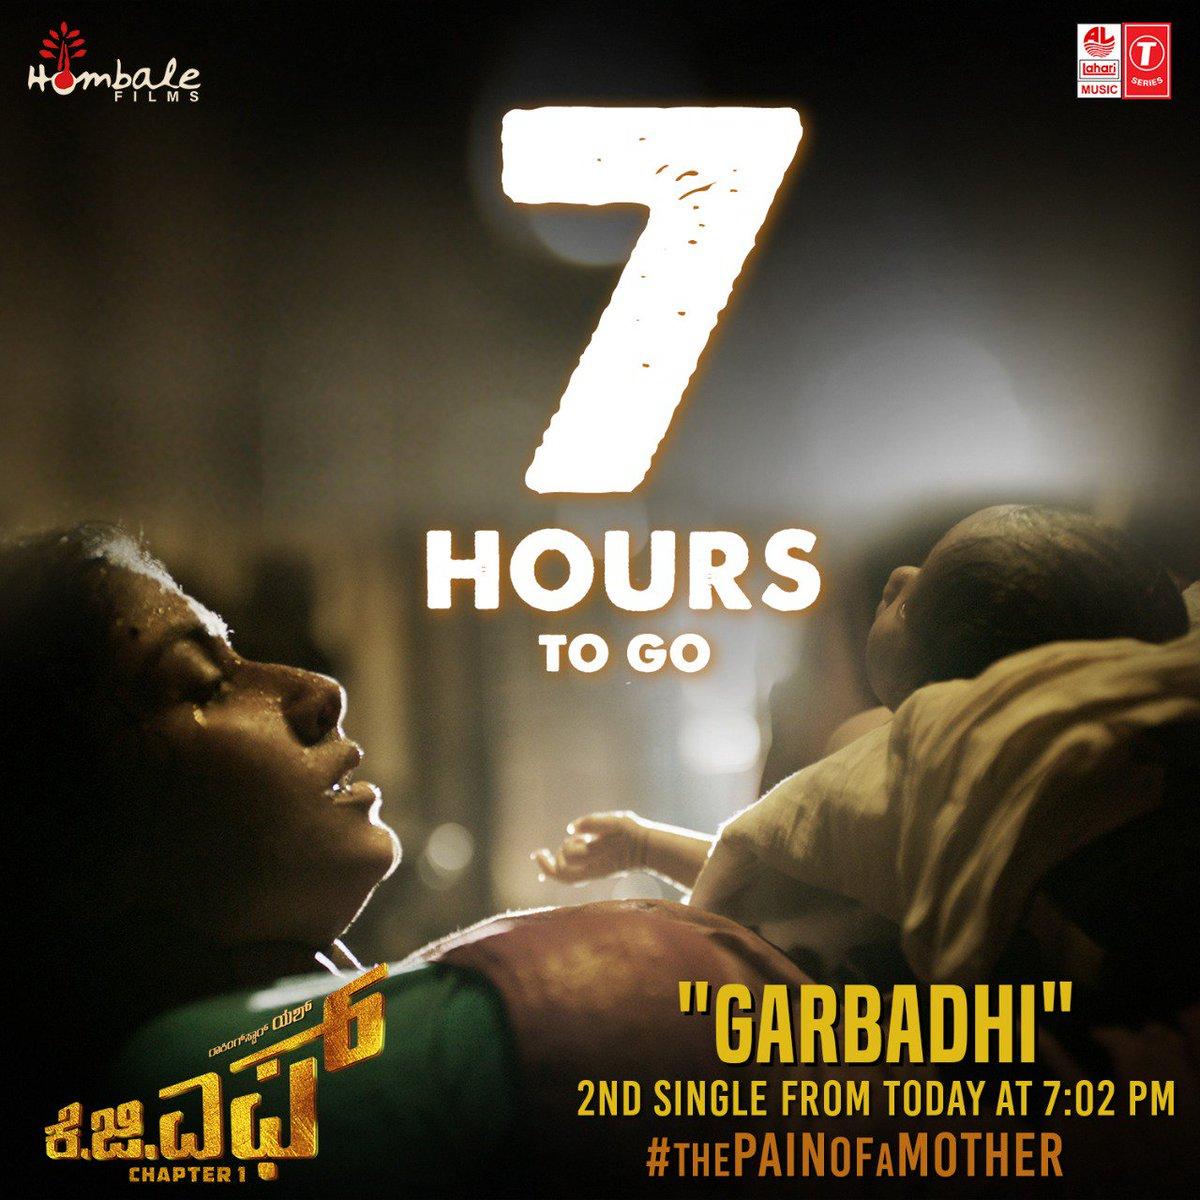 7 hours to go. Second Single from #KGF releasing today at 7:02 PM. Stay tuned to @LahariMusic - http://bit.ly/SubscribeLahari  #Thepainofamother @TheNameIsYash @SrinidhiShetty7 @prashanth_neel @bhuvangowda84 @BasrurRavi @hombalefilms @VishalKOfficial  @VaaraahiCC #KGF21Dec